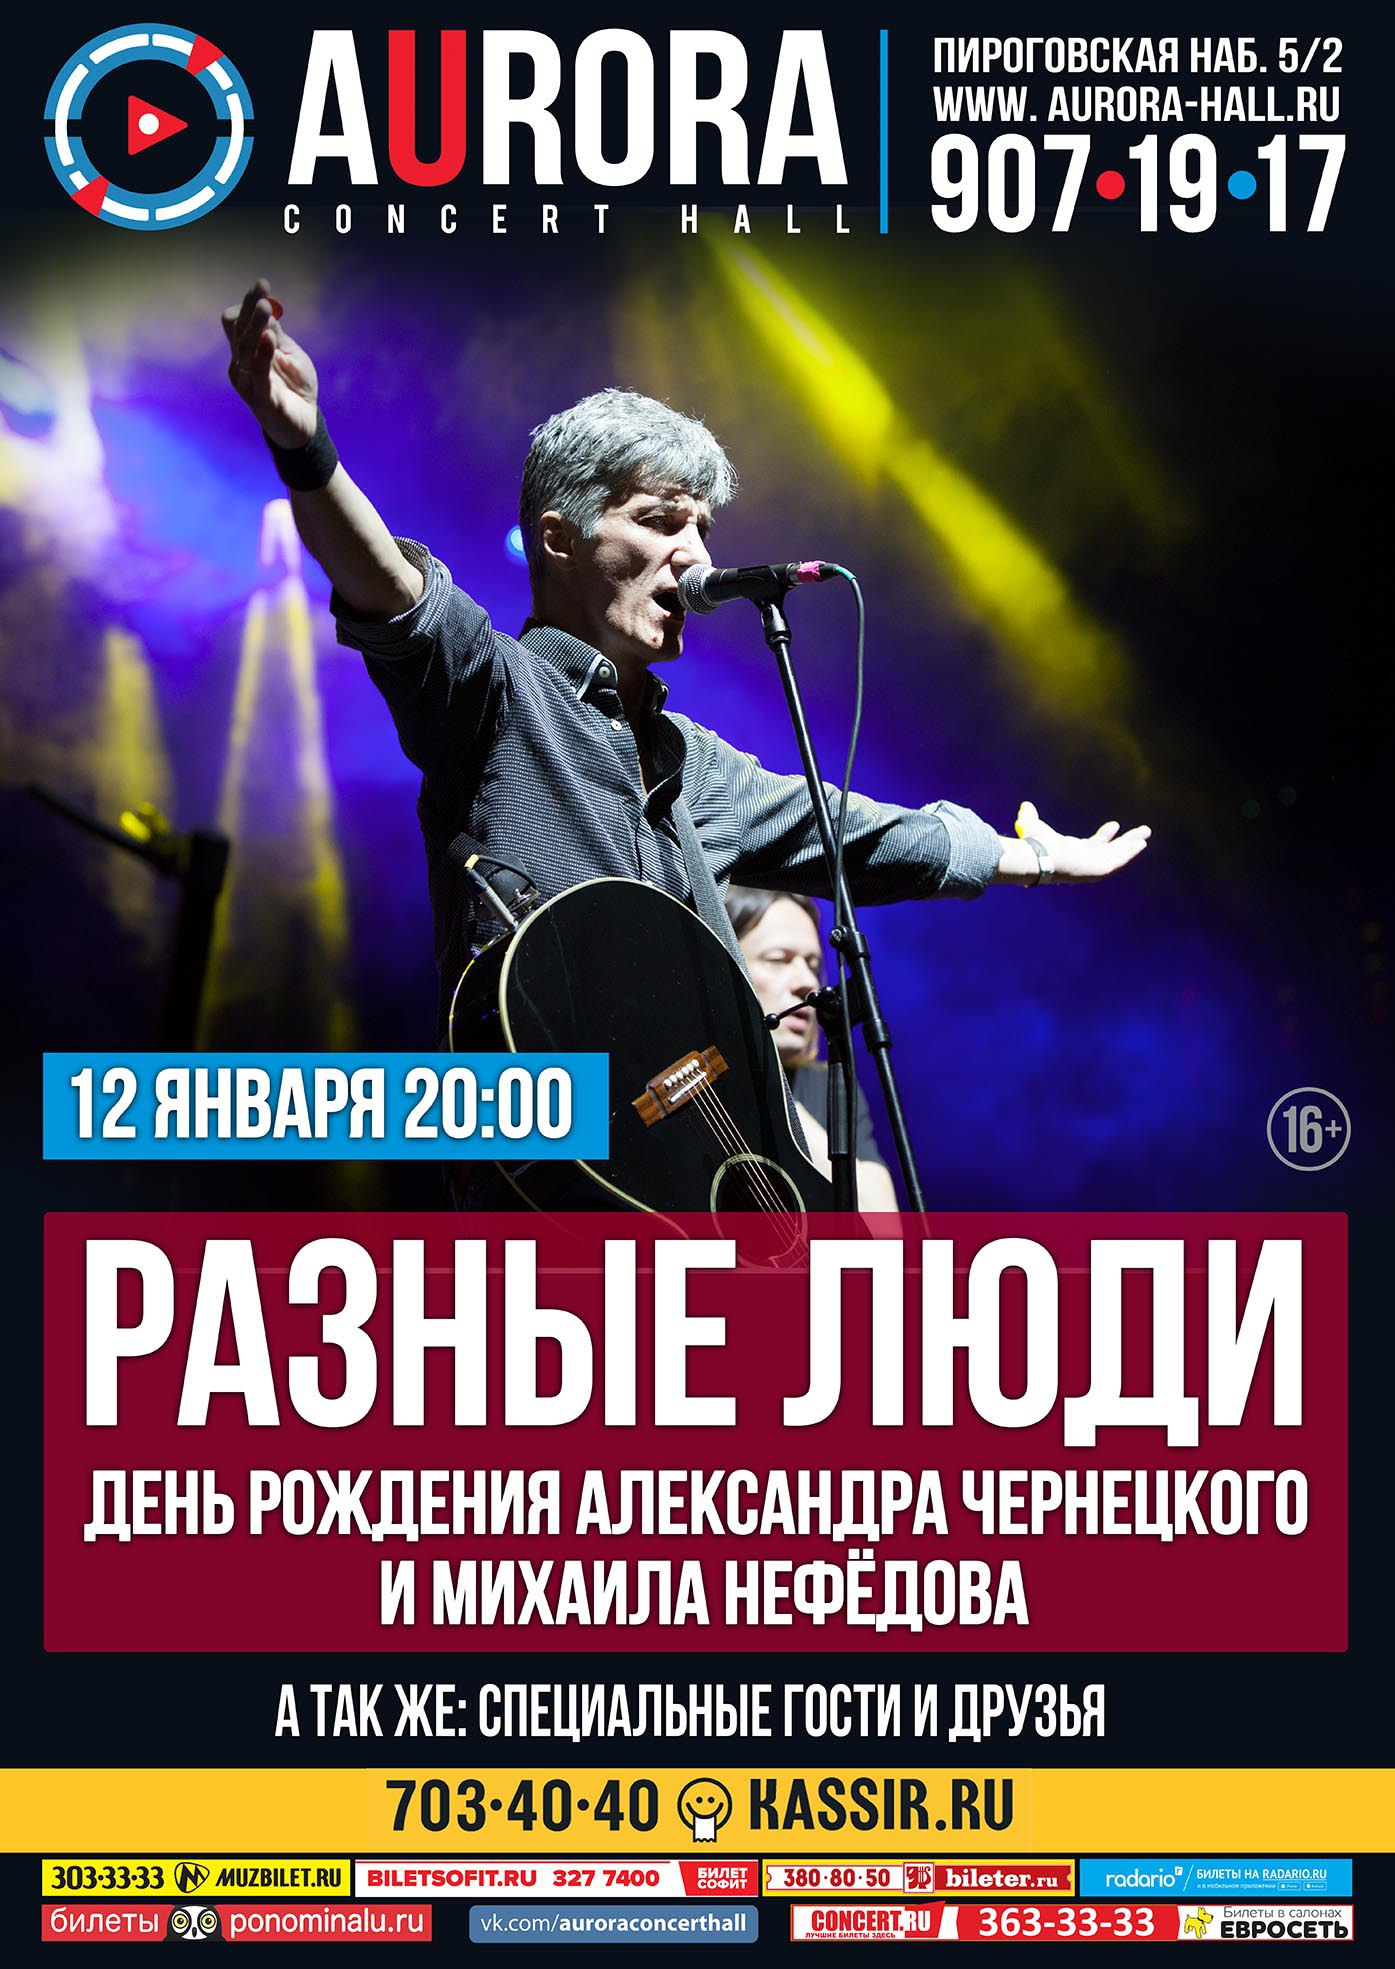 http://raznyeludi.ru/images/12.01.2017.jpg